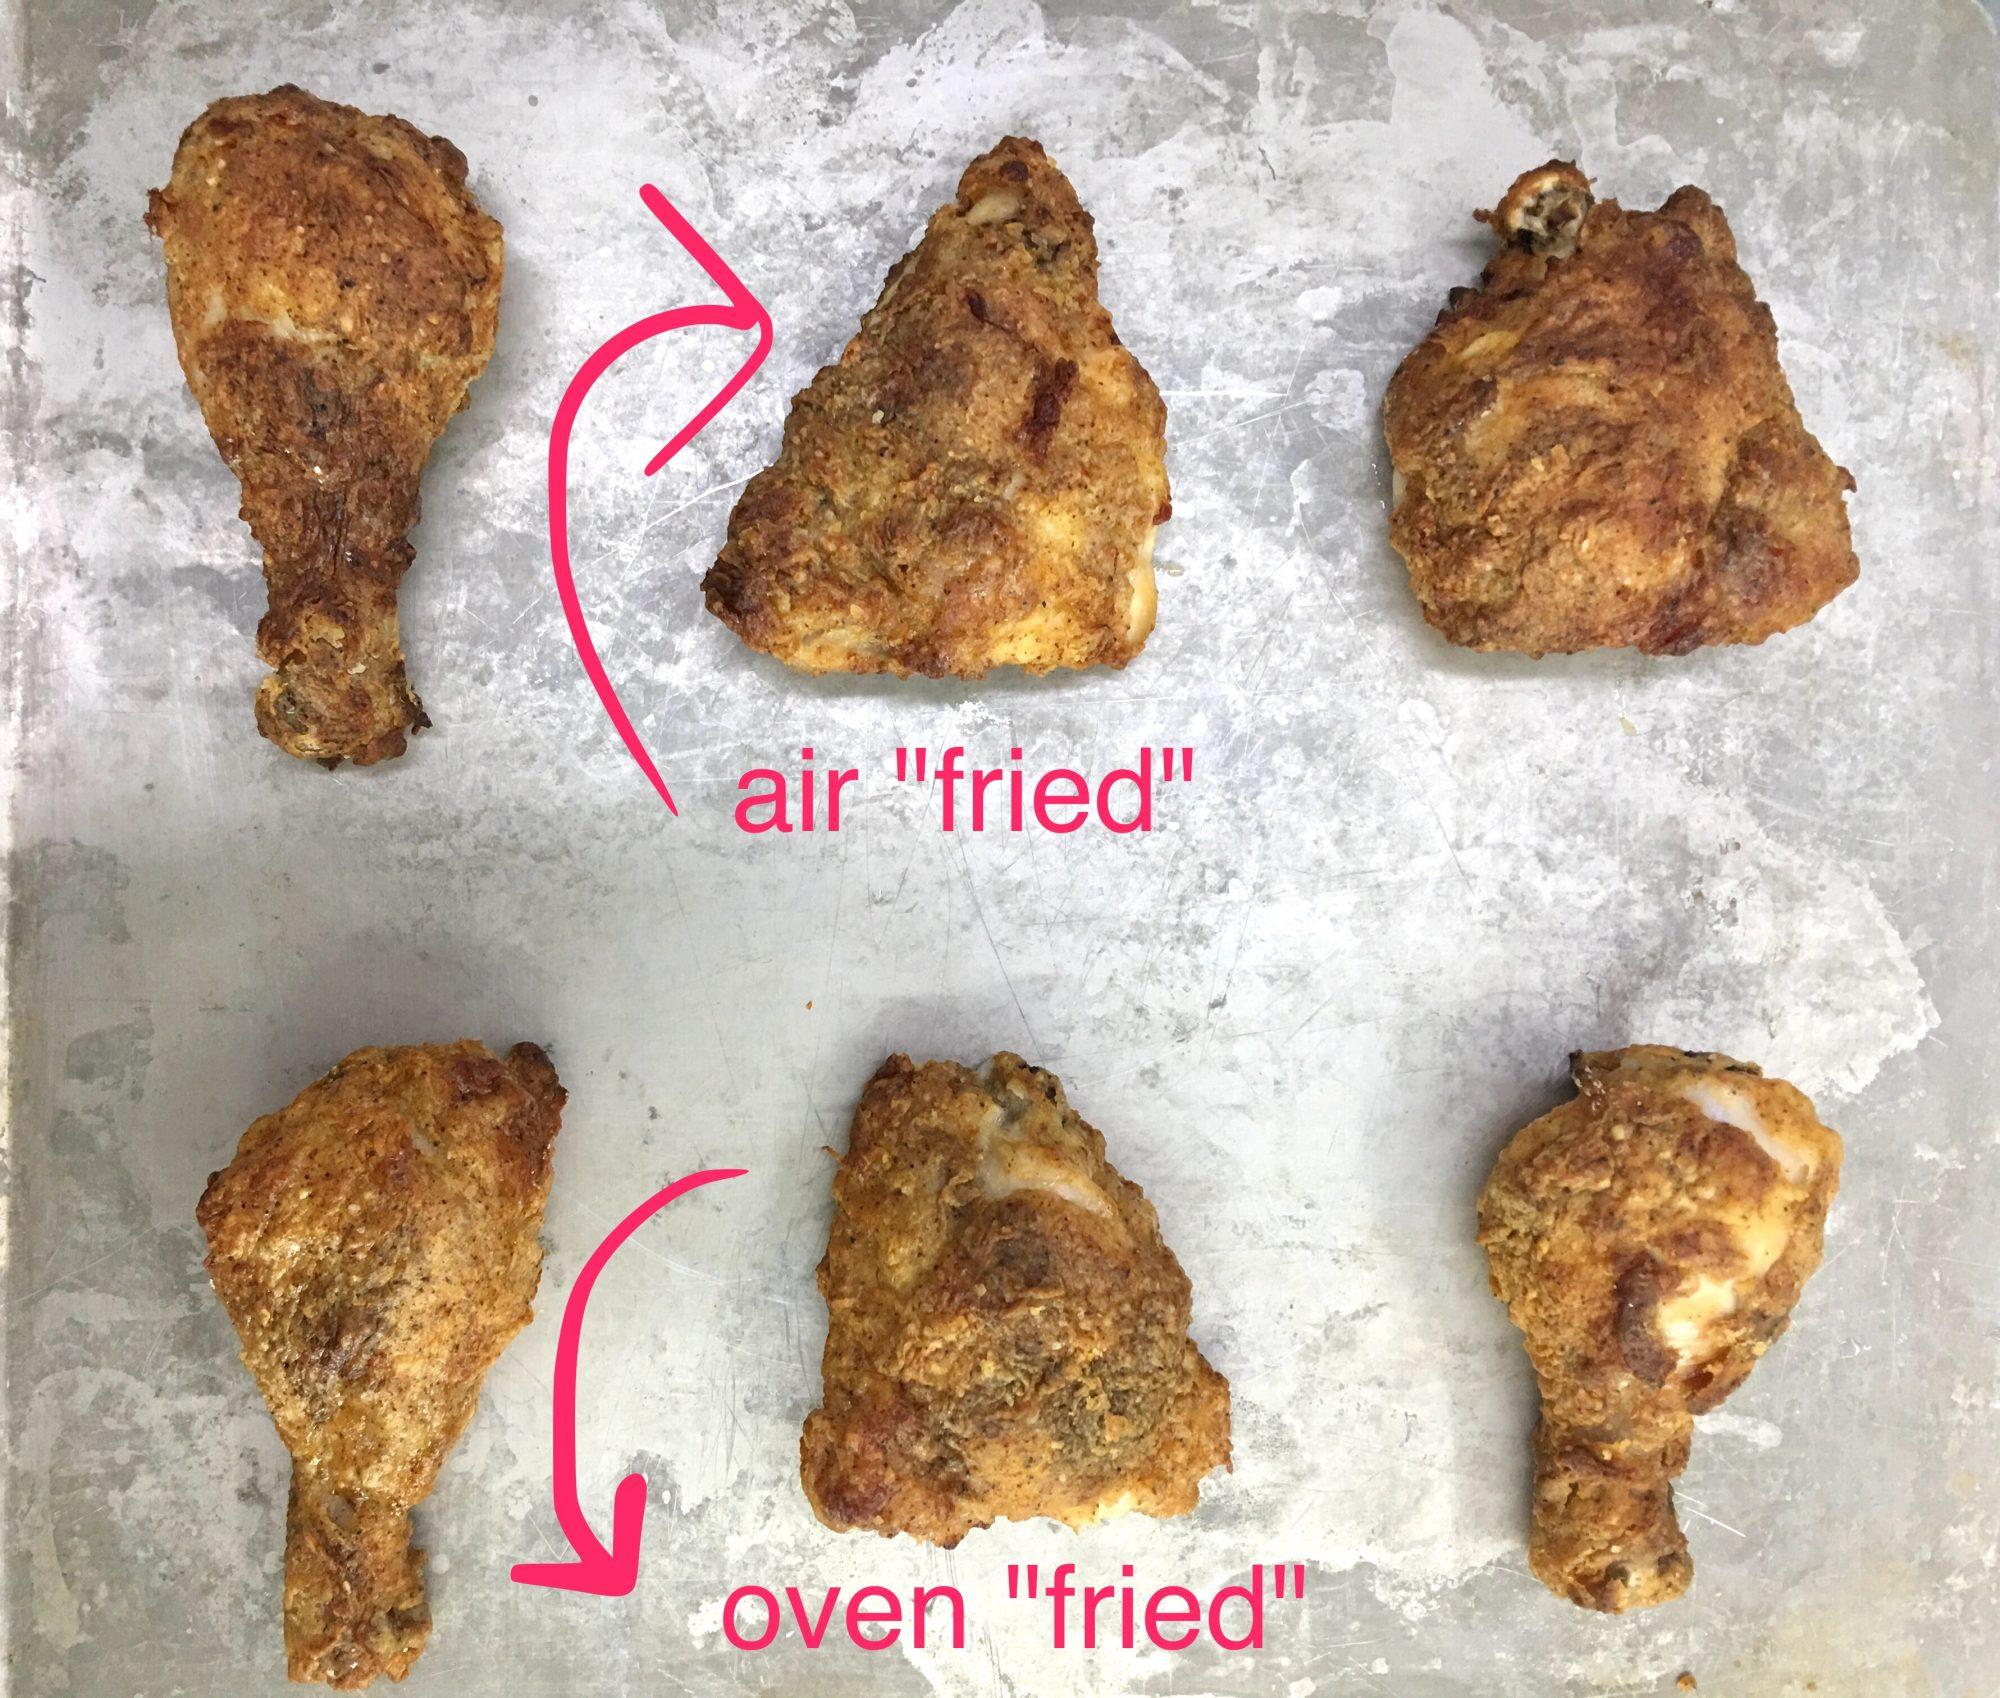 Air Fryer Vs Oven Which Yields A Crispier Faux Fry Myrecipes